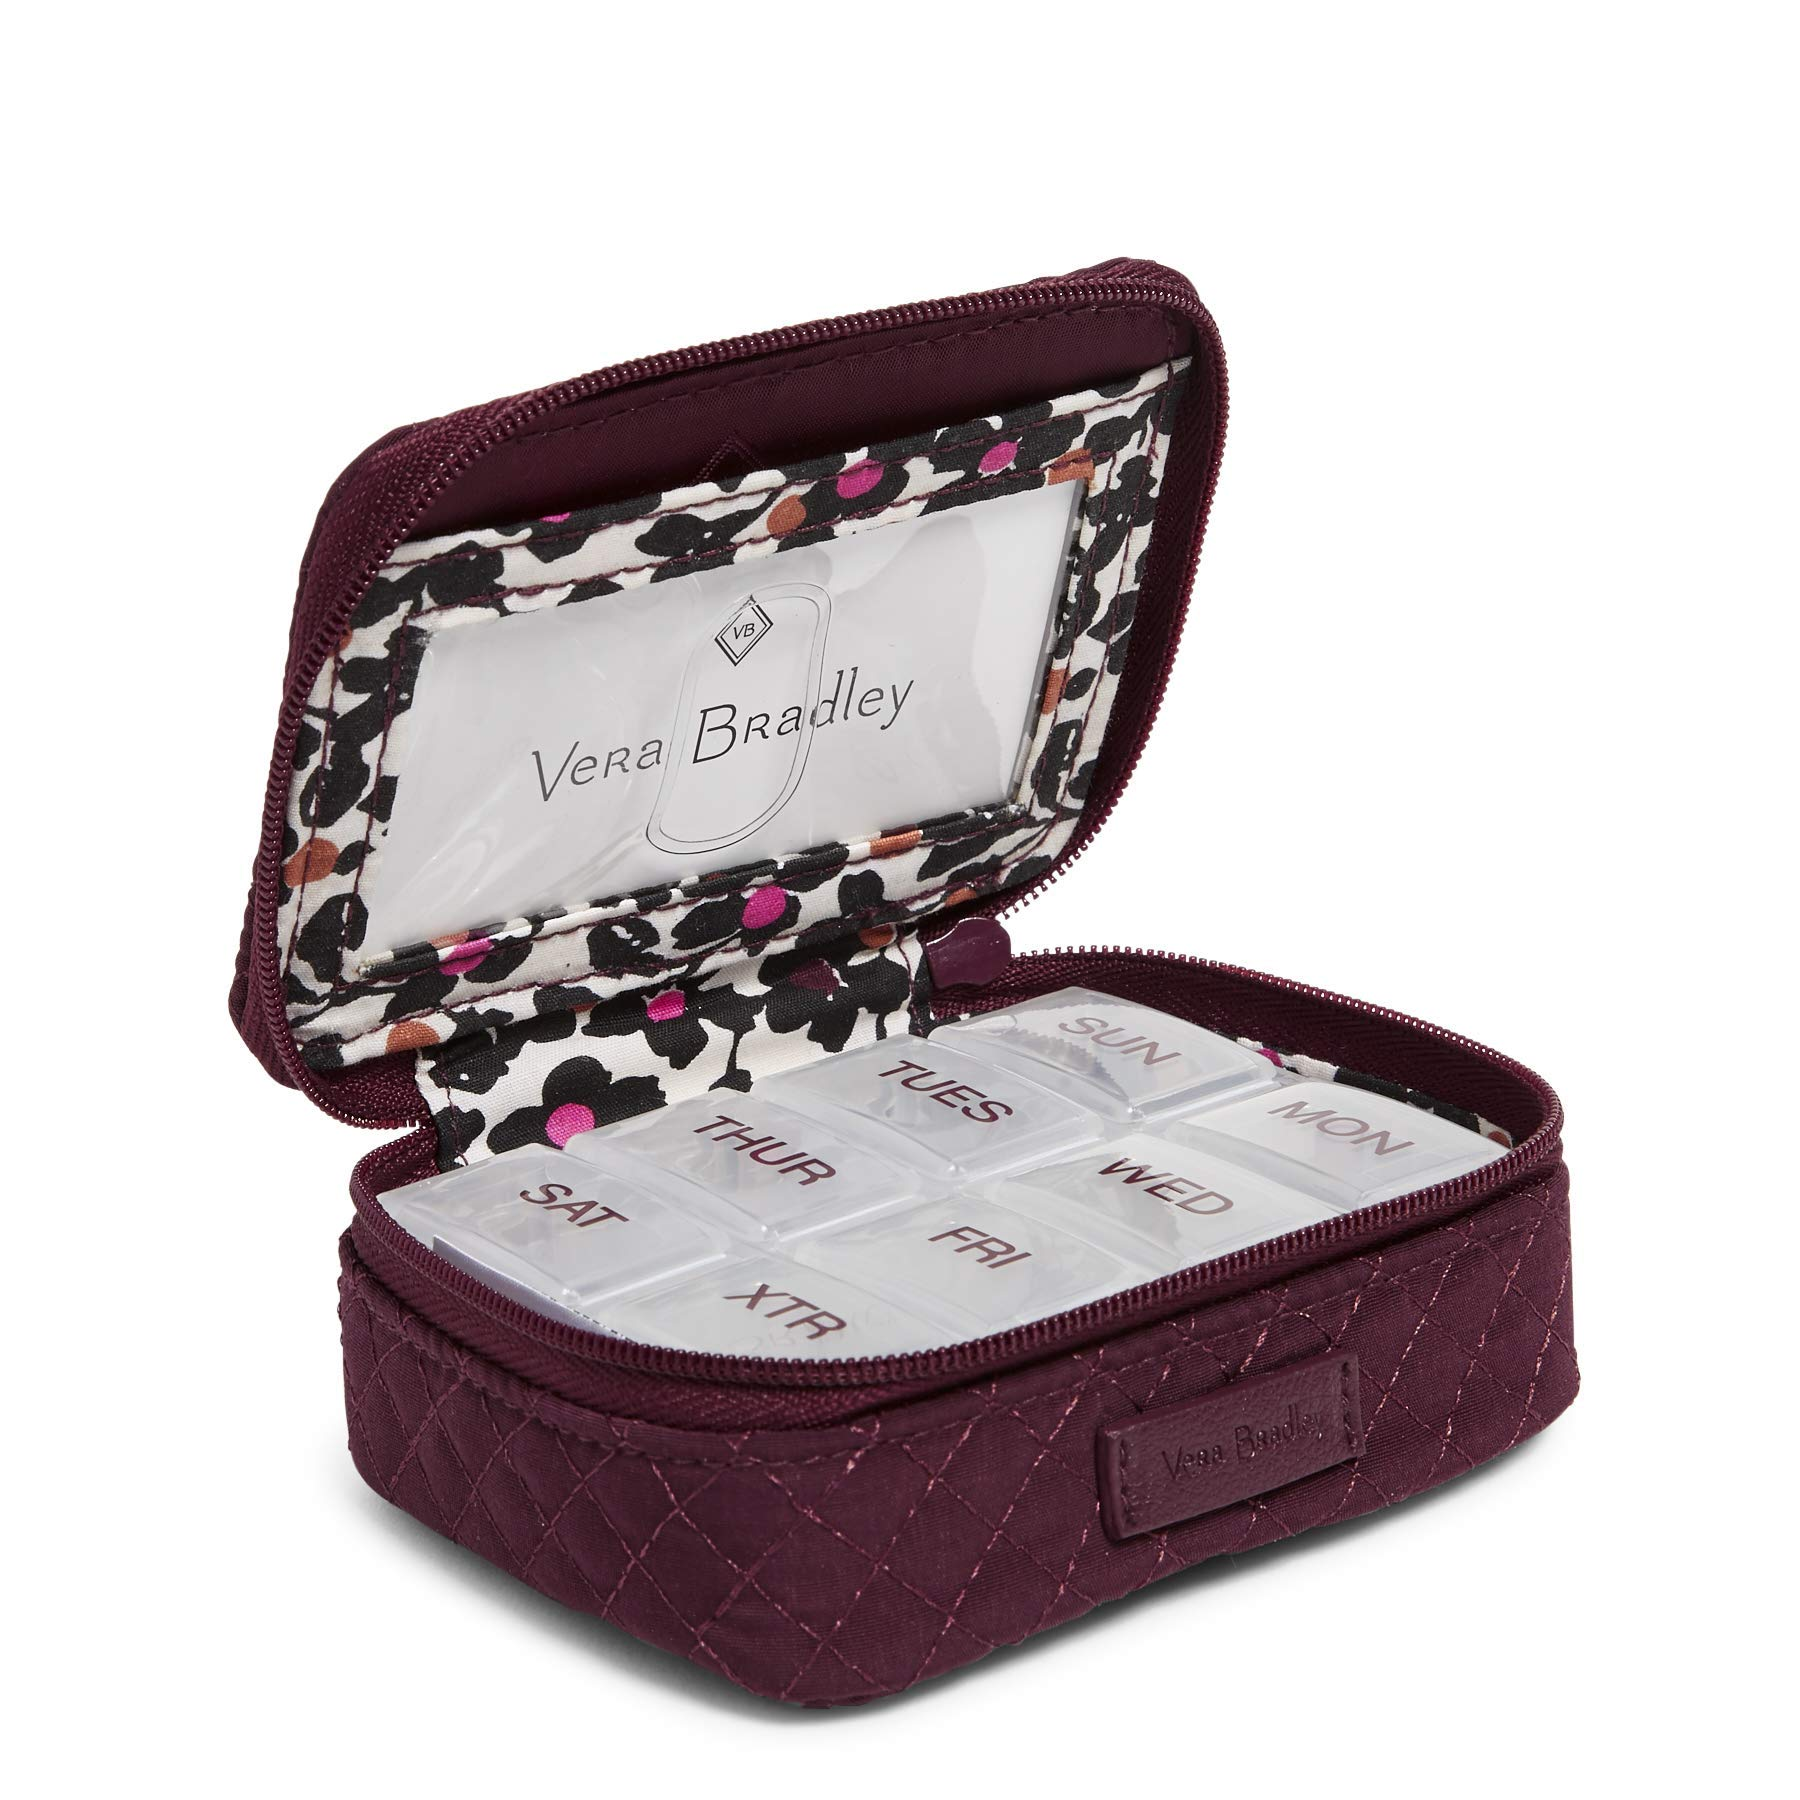 Vera Bradley Iconic Travel Pill Case, Microfiber, Mulled Wine by Vera Bradley